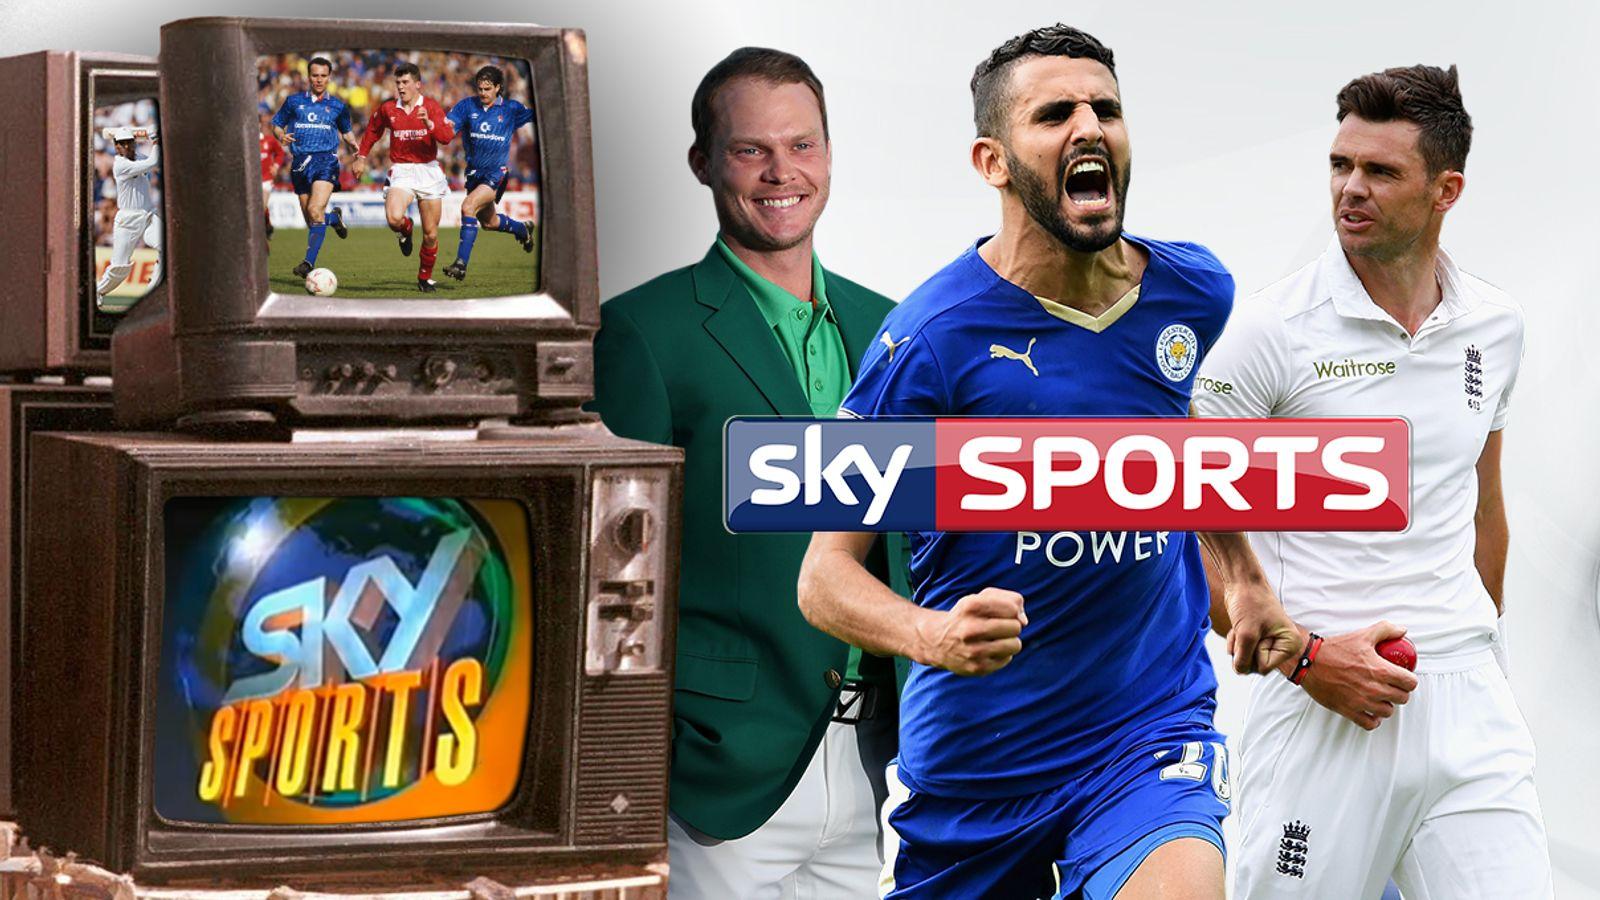 Sky Sports has changed way we enjoy sport since launch in 1991